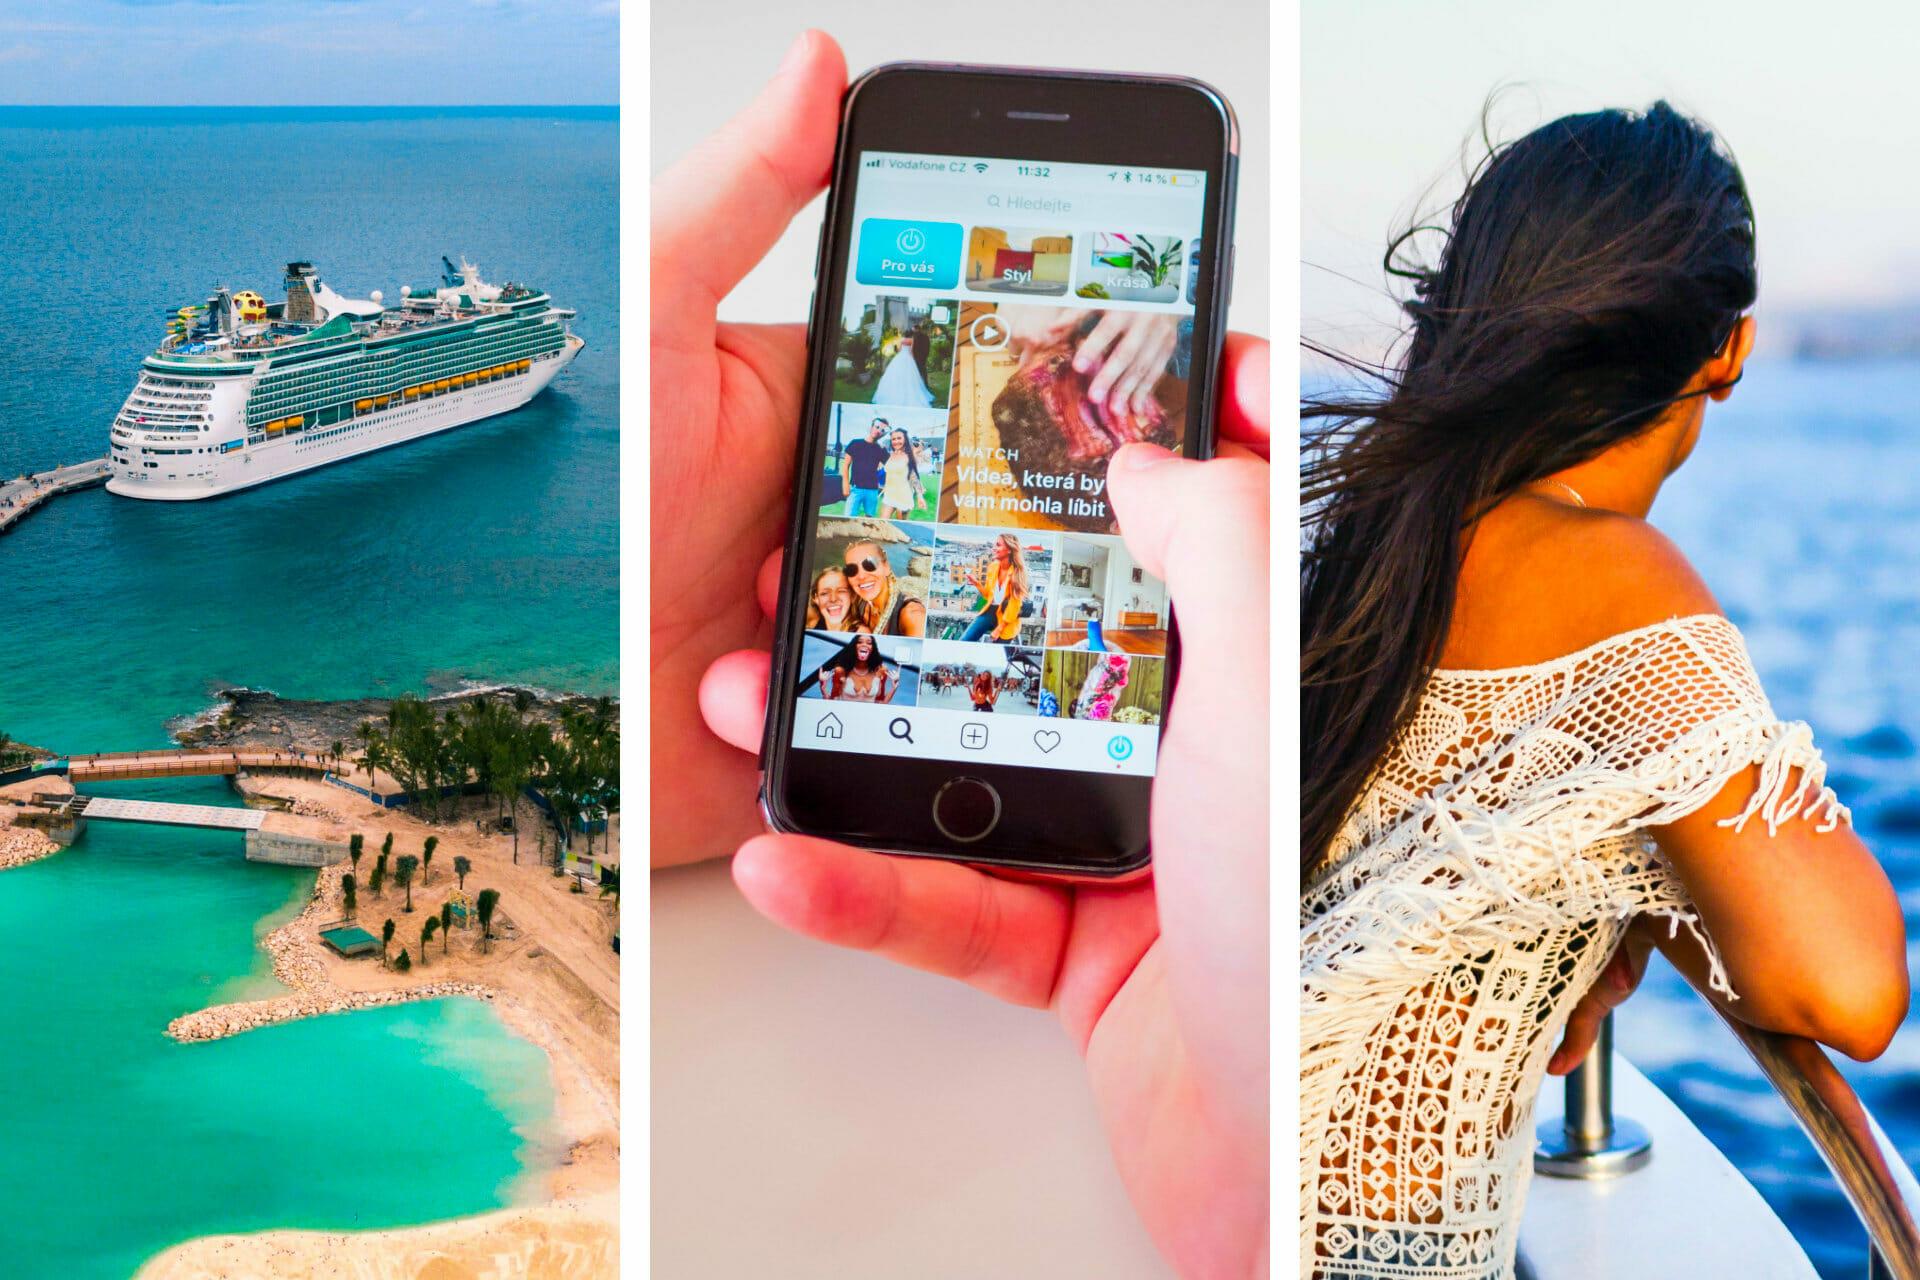 53 Unique Cruise Instagram Captions for the Perfect Post via @allamericanatlas